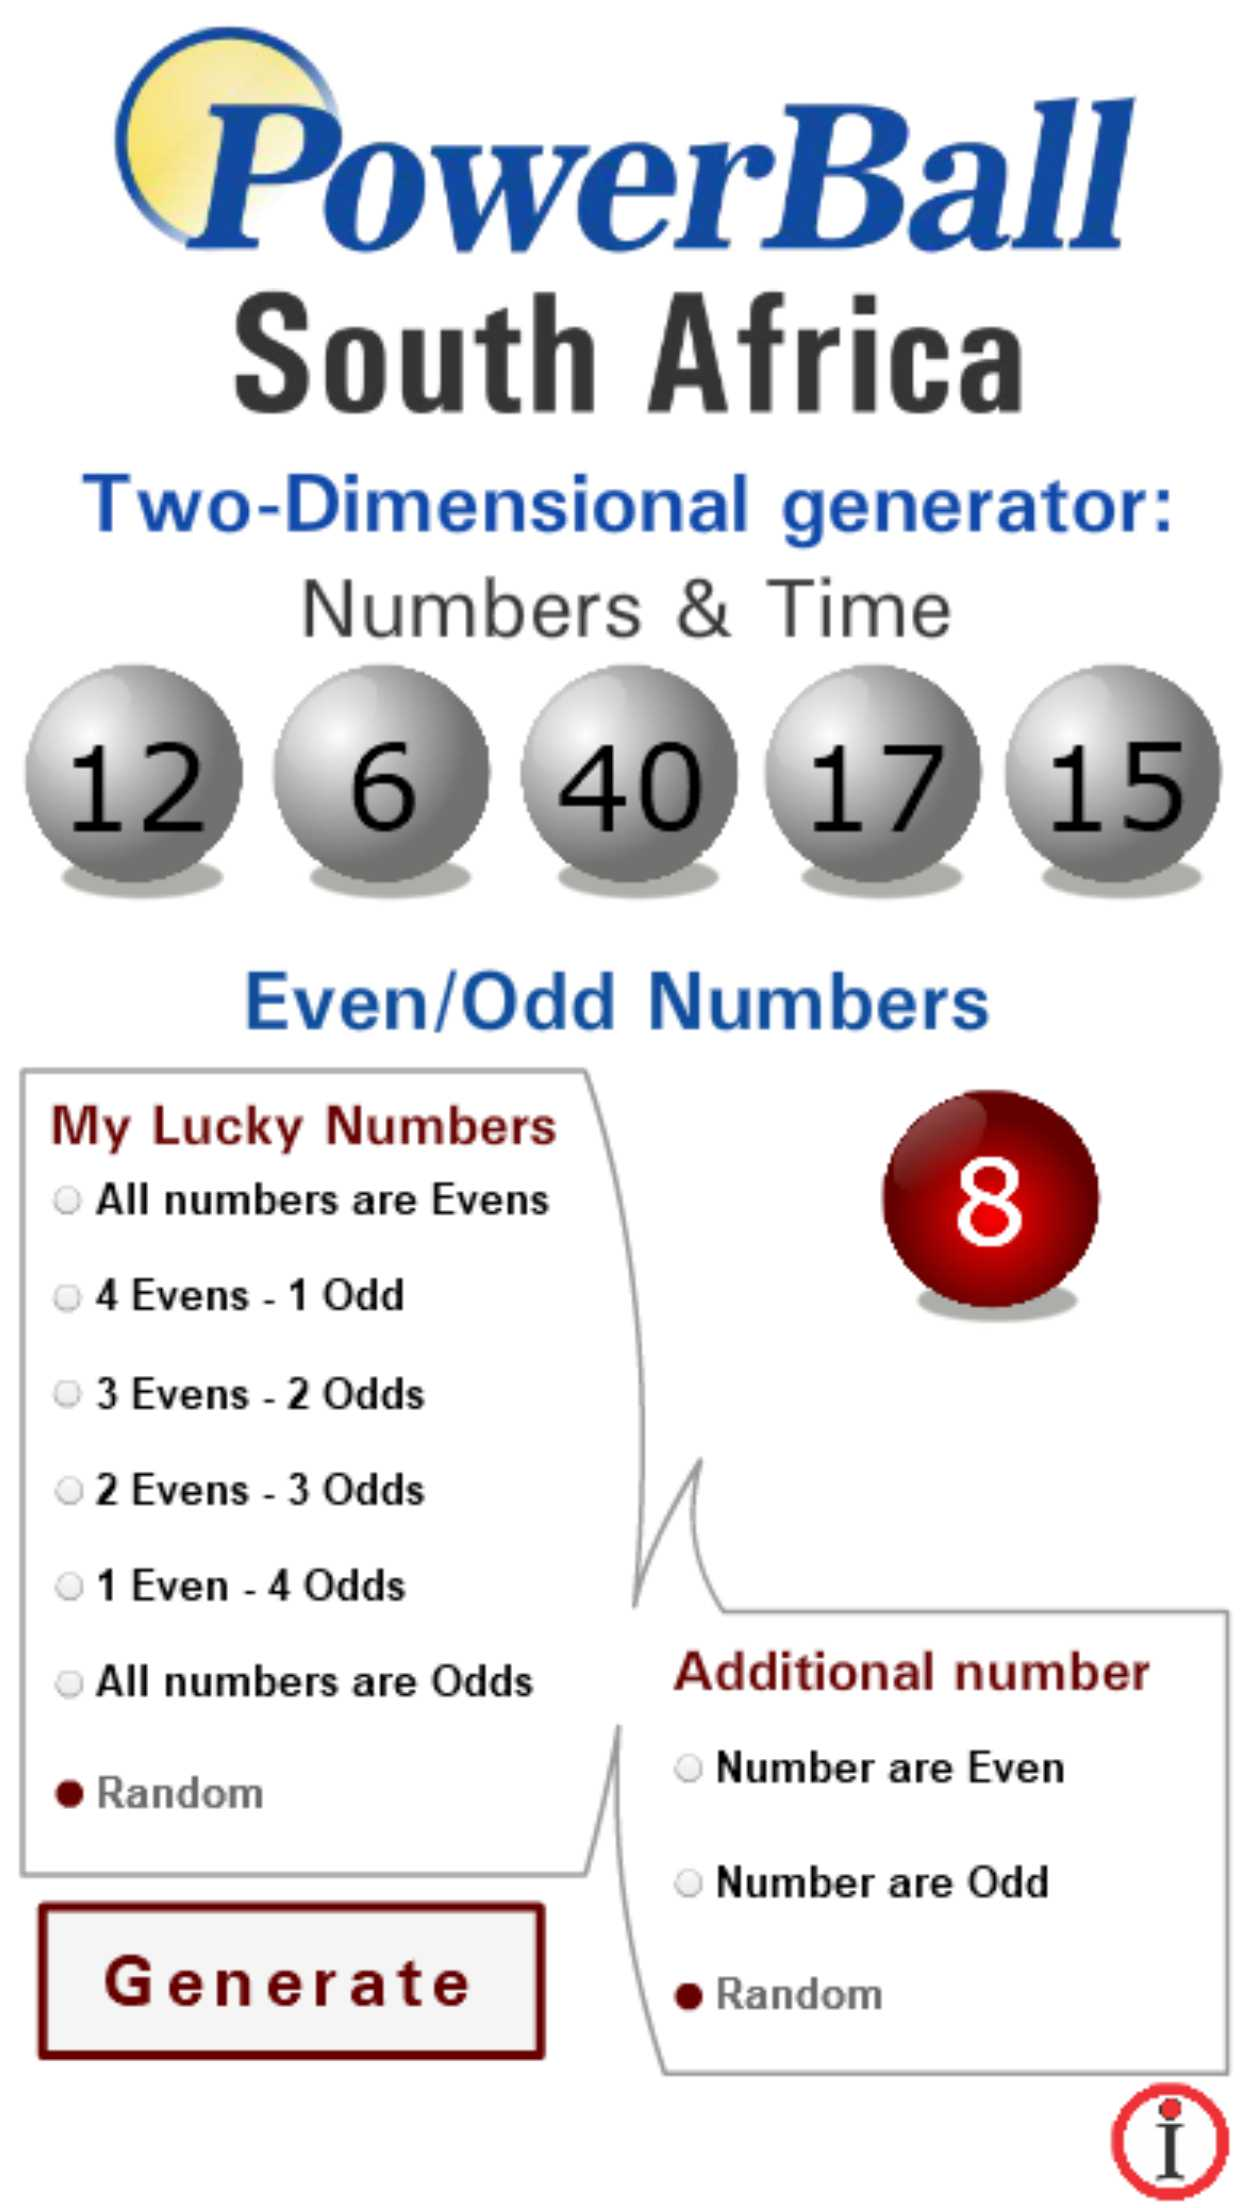 Powerball statistics